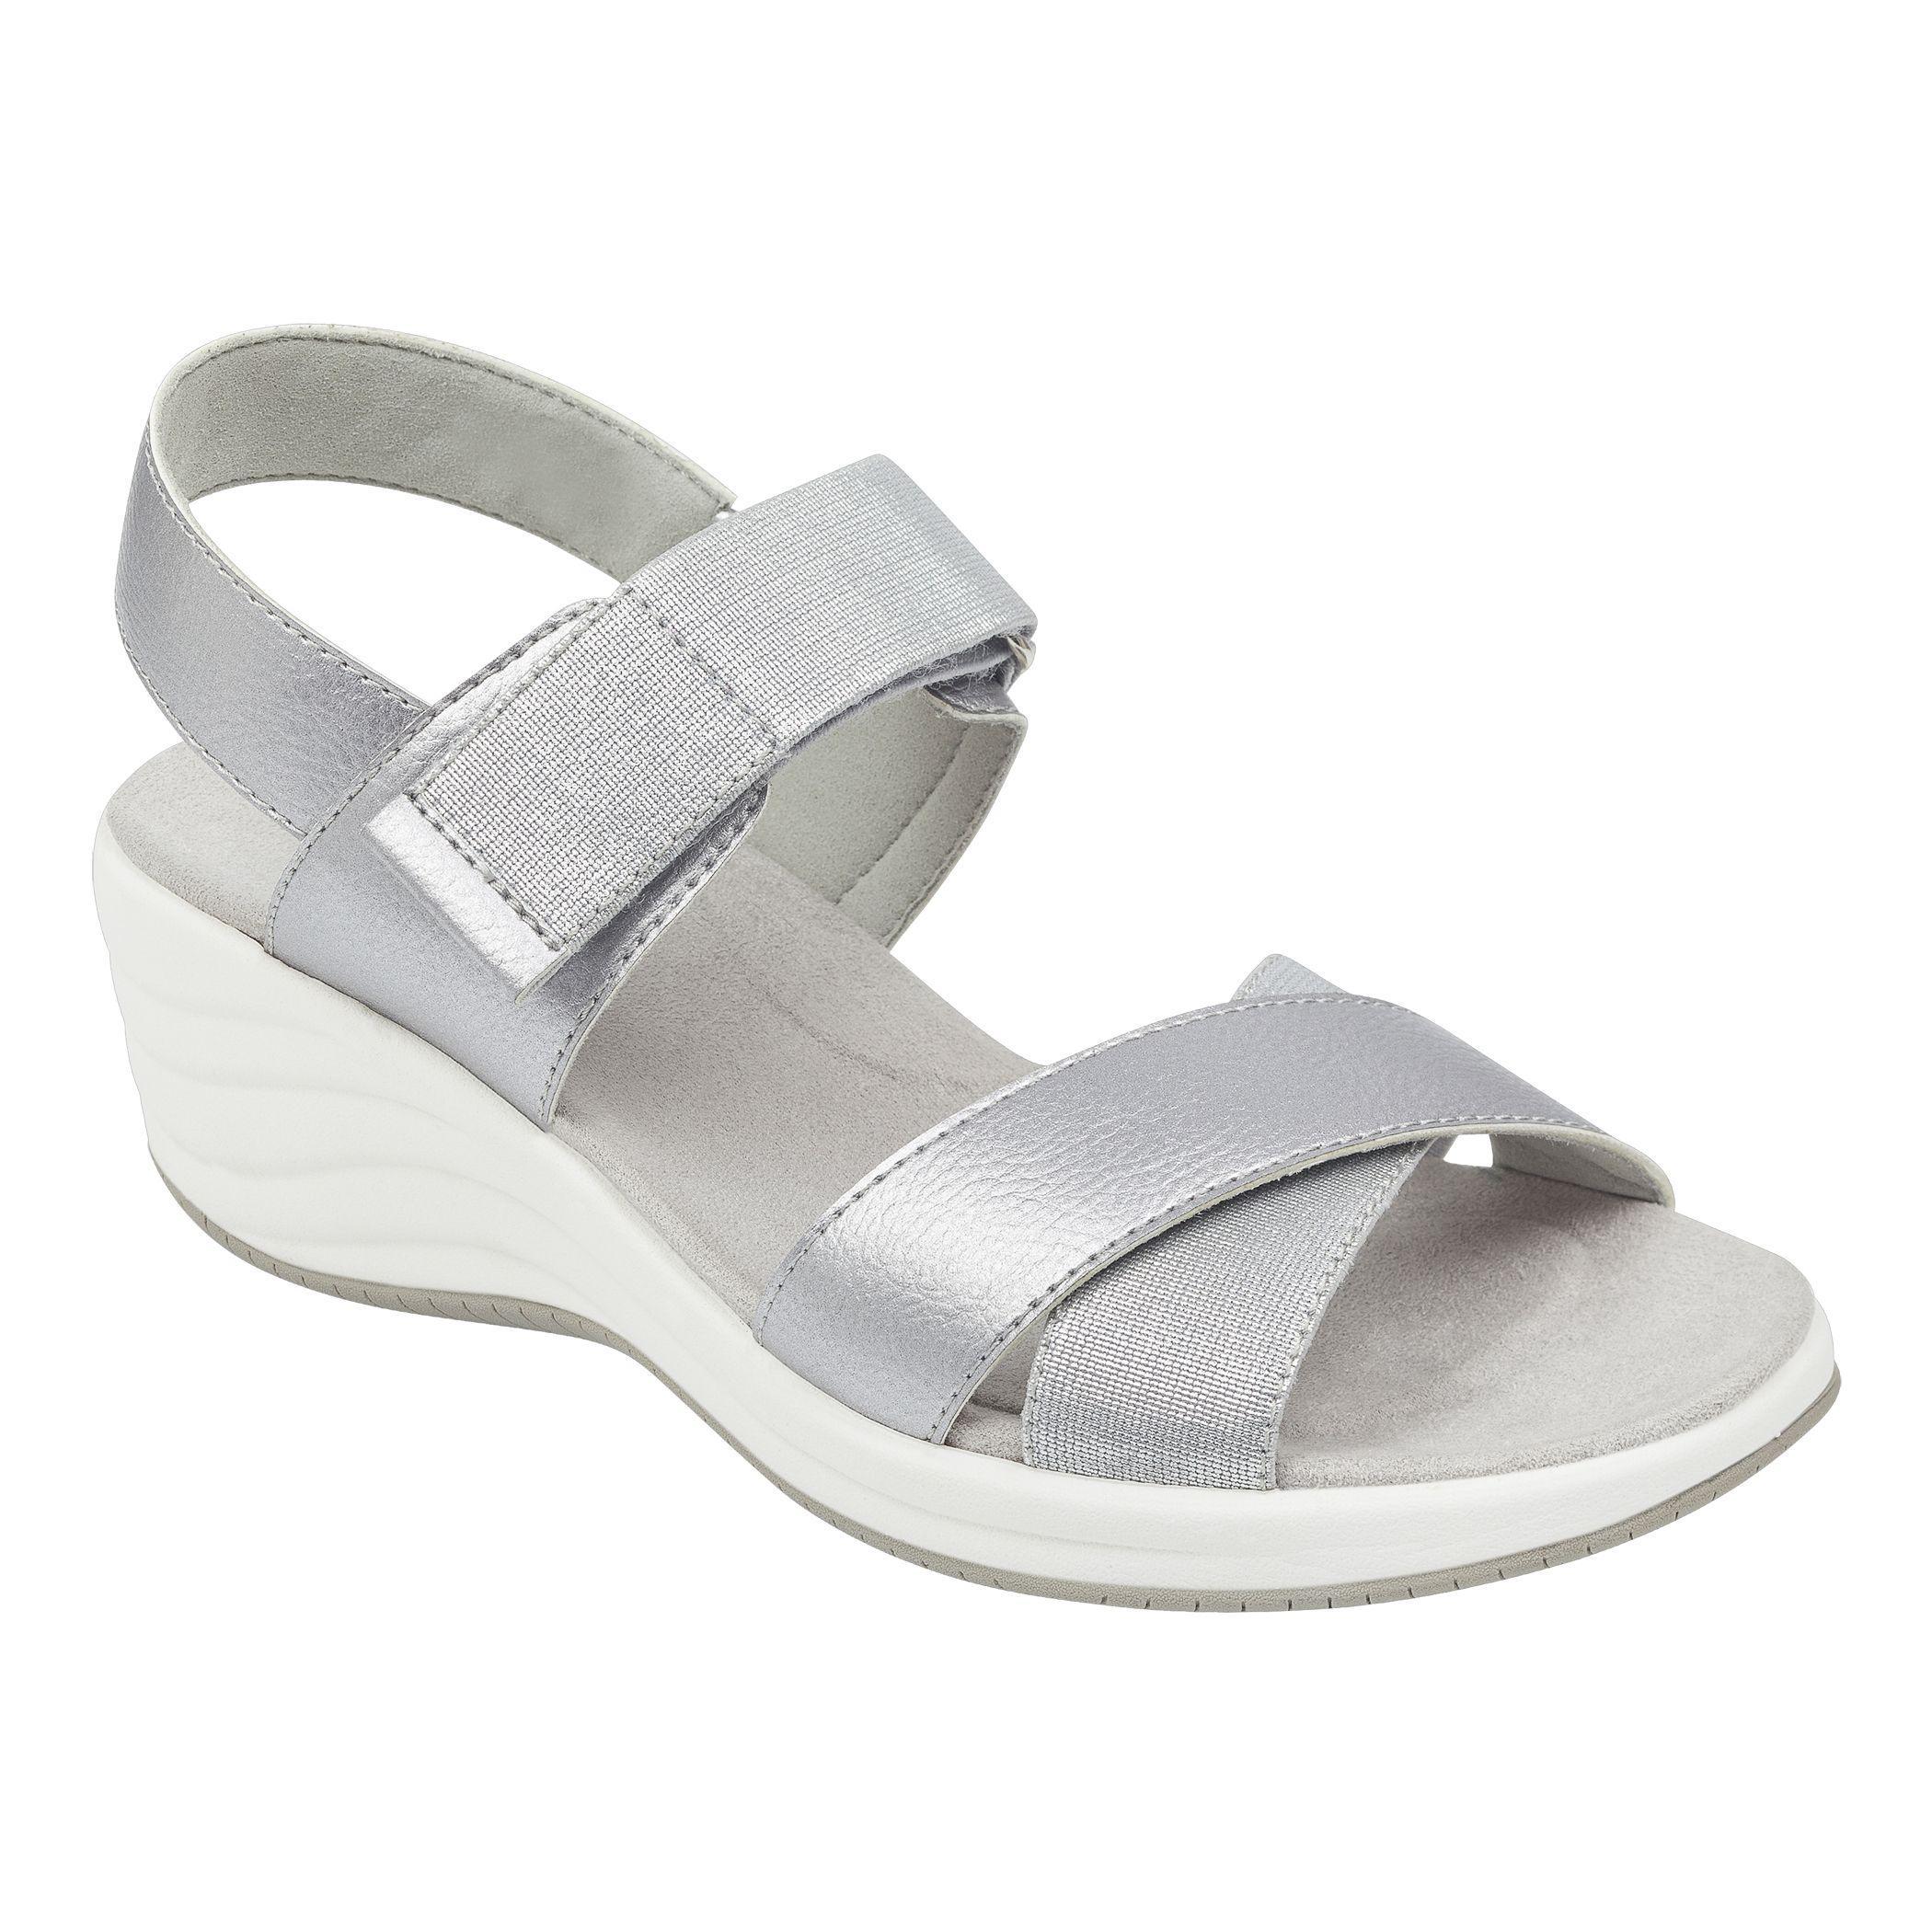 a9a97e5c646e Lyst - Easy Spirit Darry Wedge Sandals in Metallic